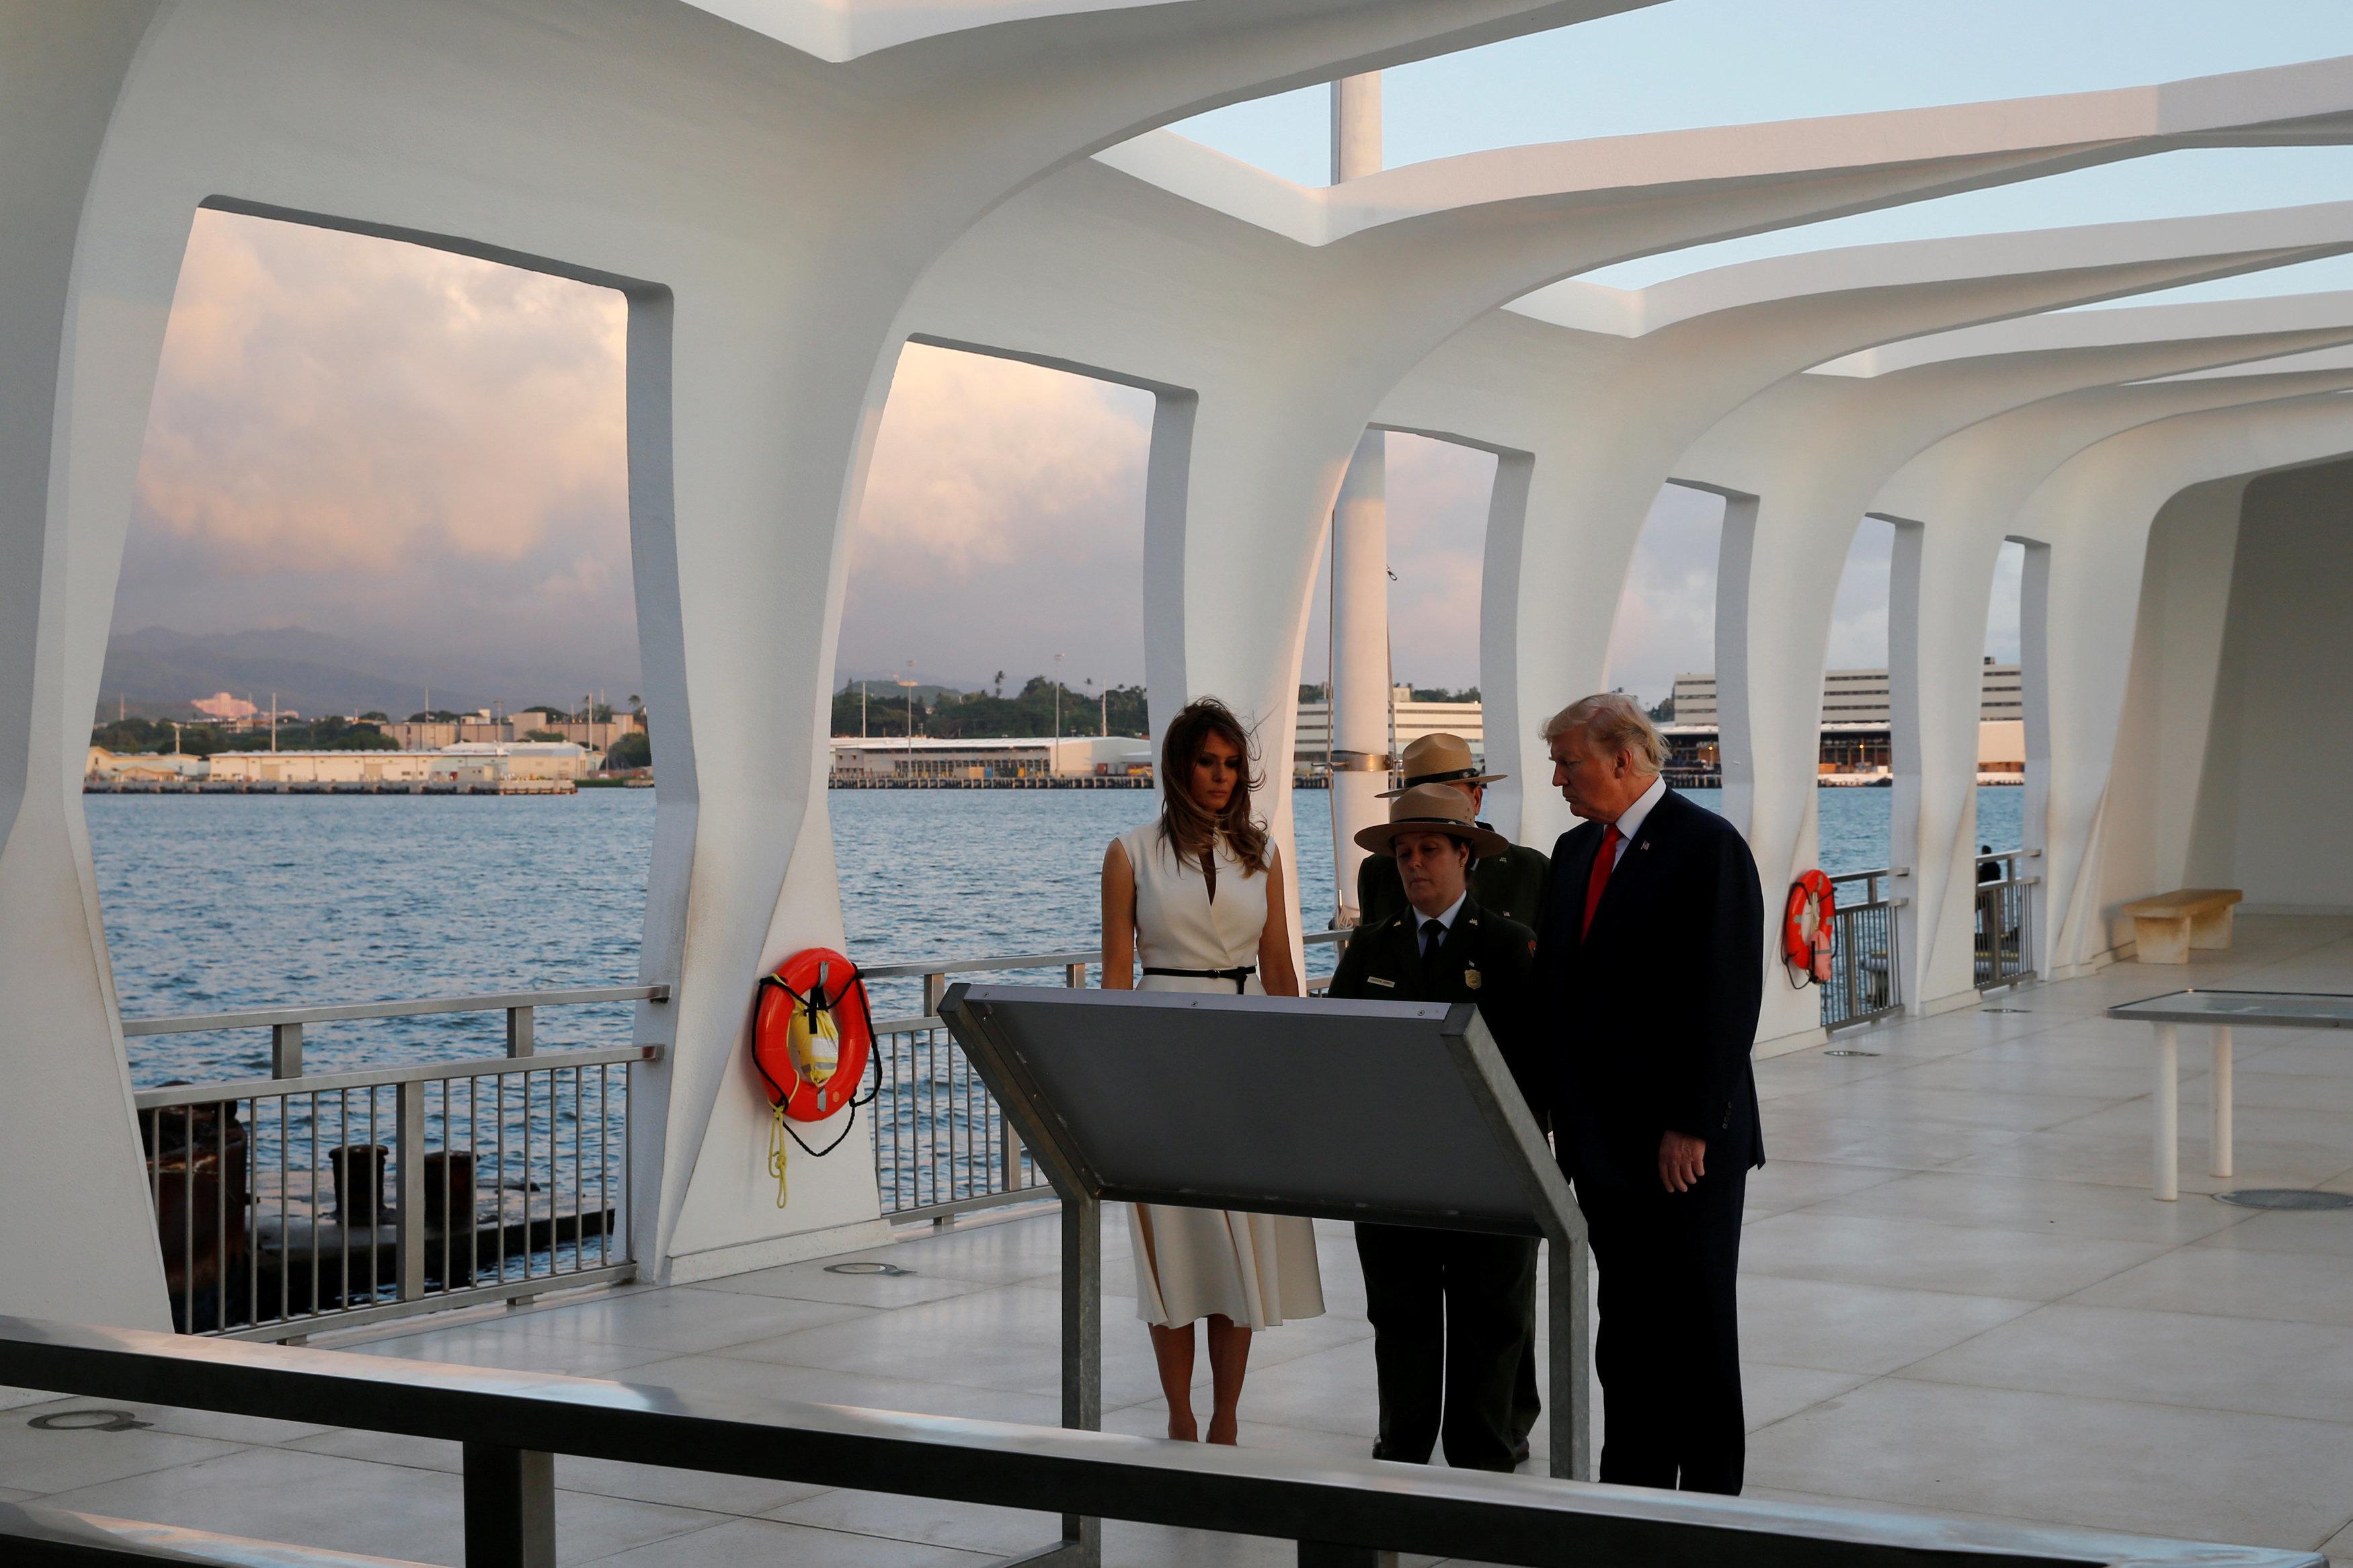 Hawaii Trolls Donald Trump With 'Welcome To Kenya'